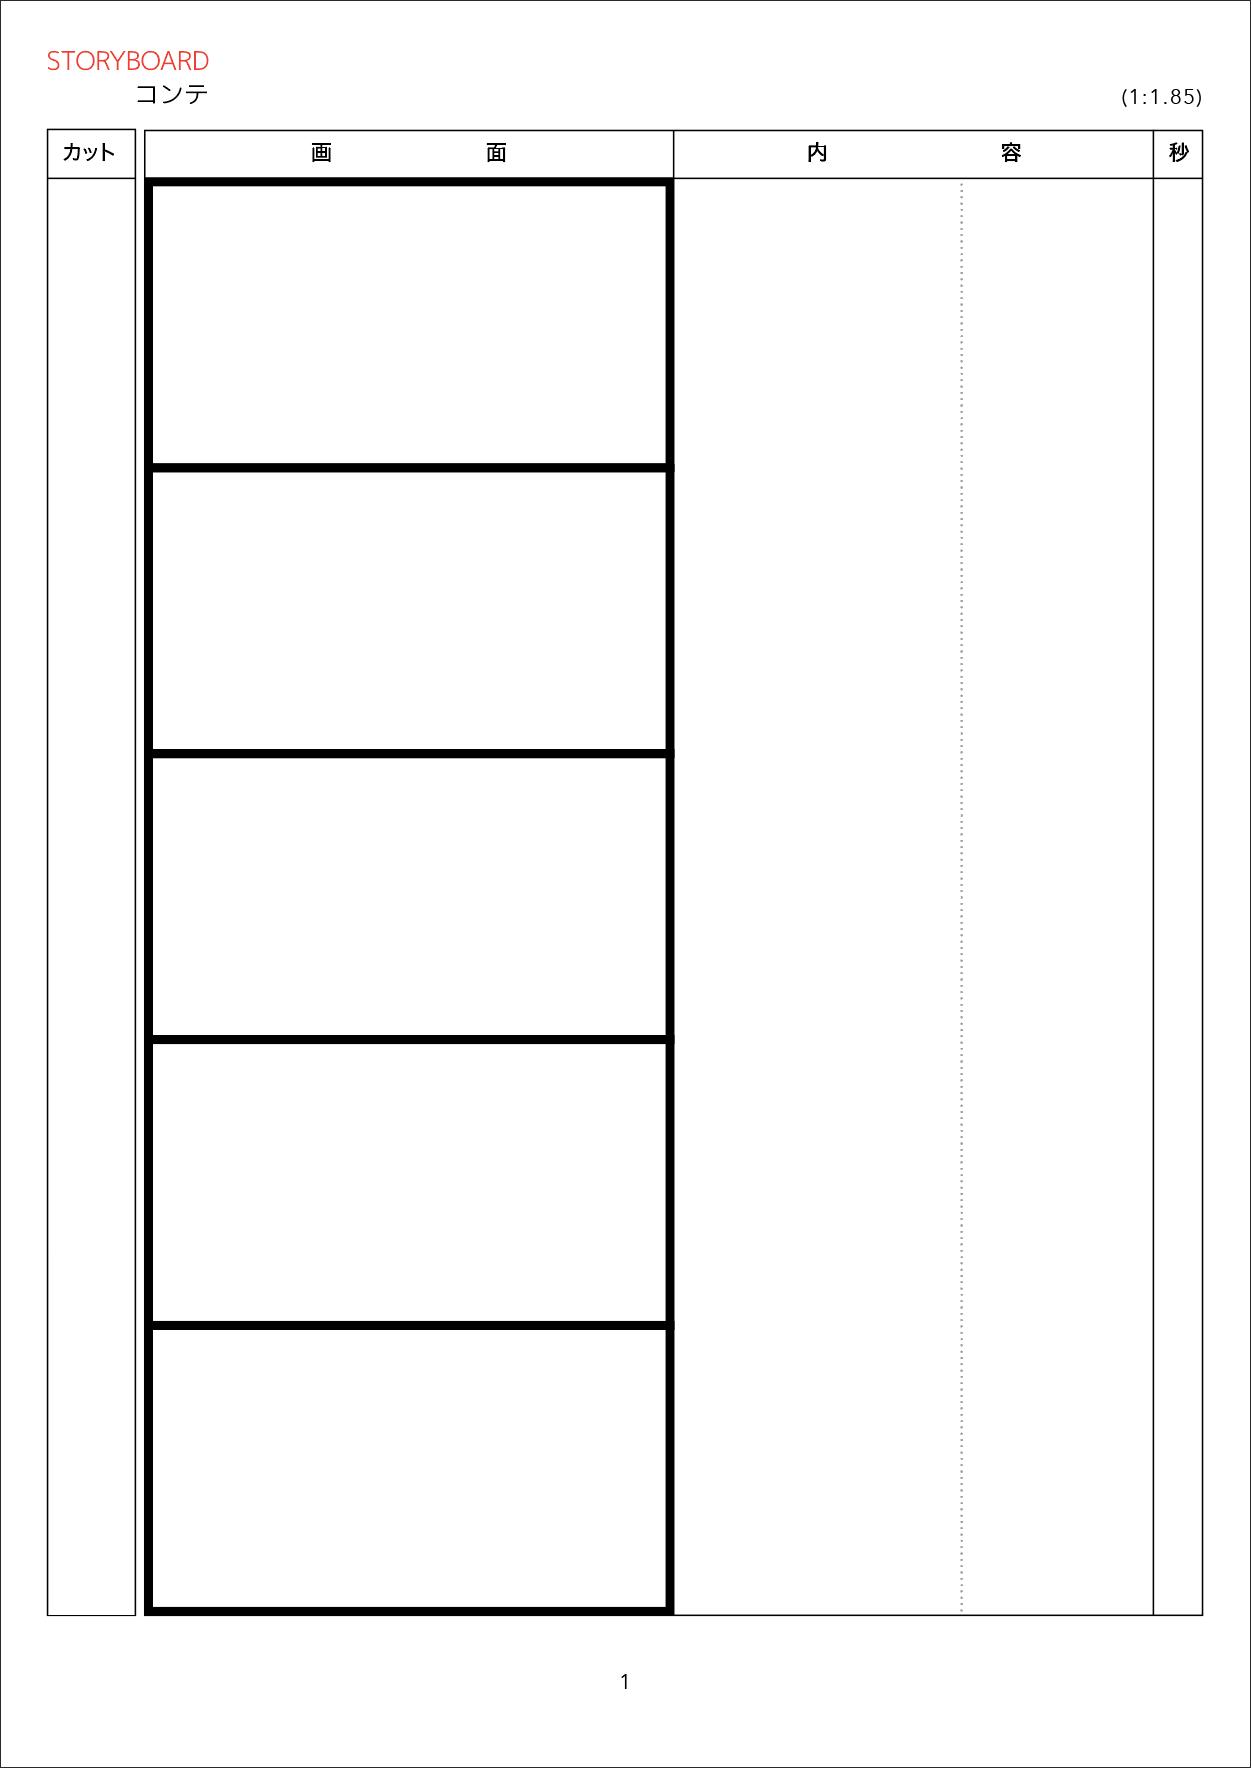 Blank Storyboard Template. Japanese Anime Storyboard Templates Film  Storyboards Medium